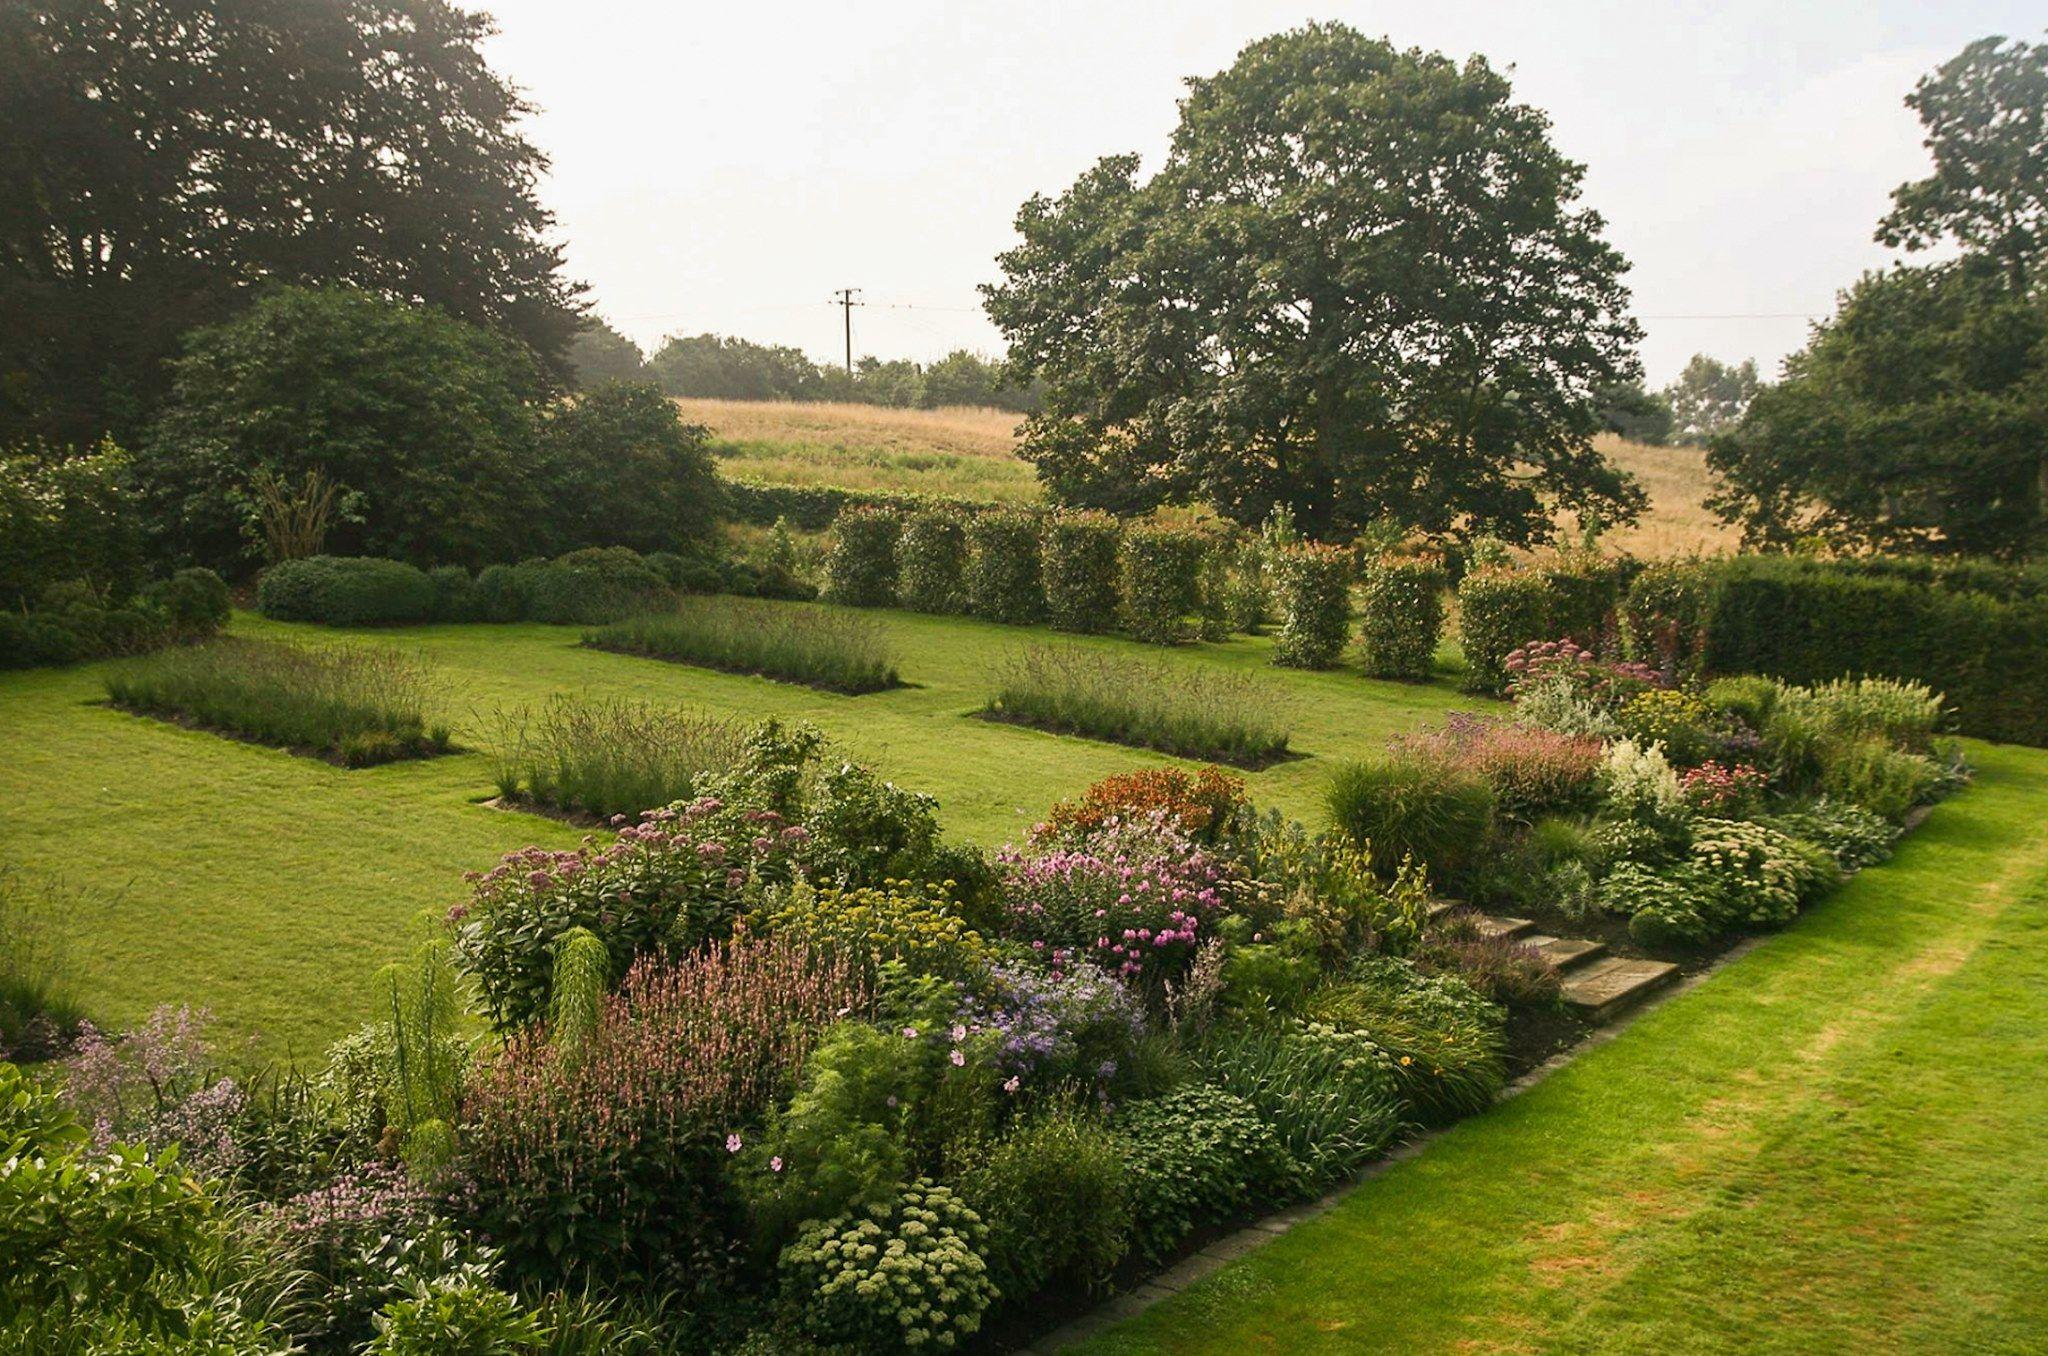 Pin By Jana Vasilova On Schody Chodniky A Naslapy In 2020 Landscape Design Beautiful Gardens Allen Gardens